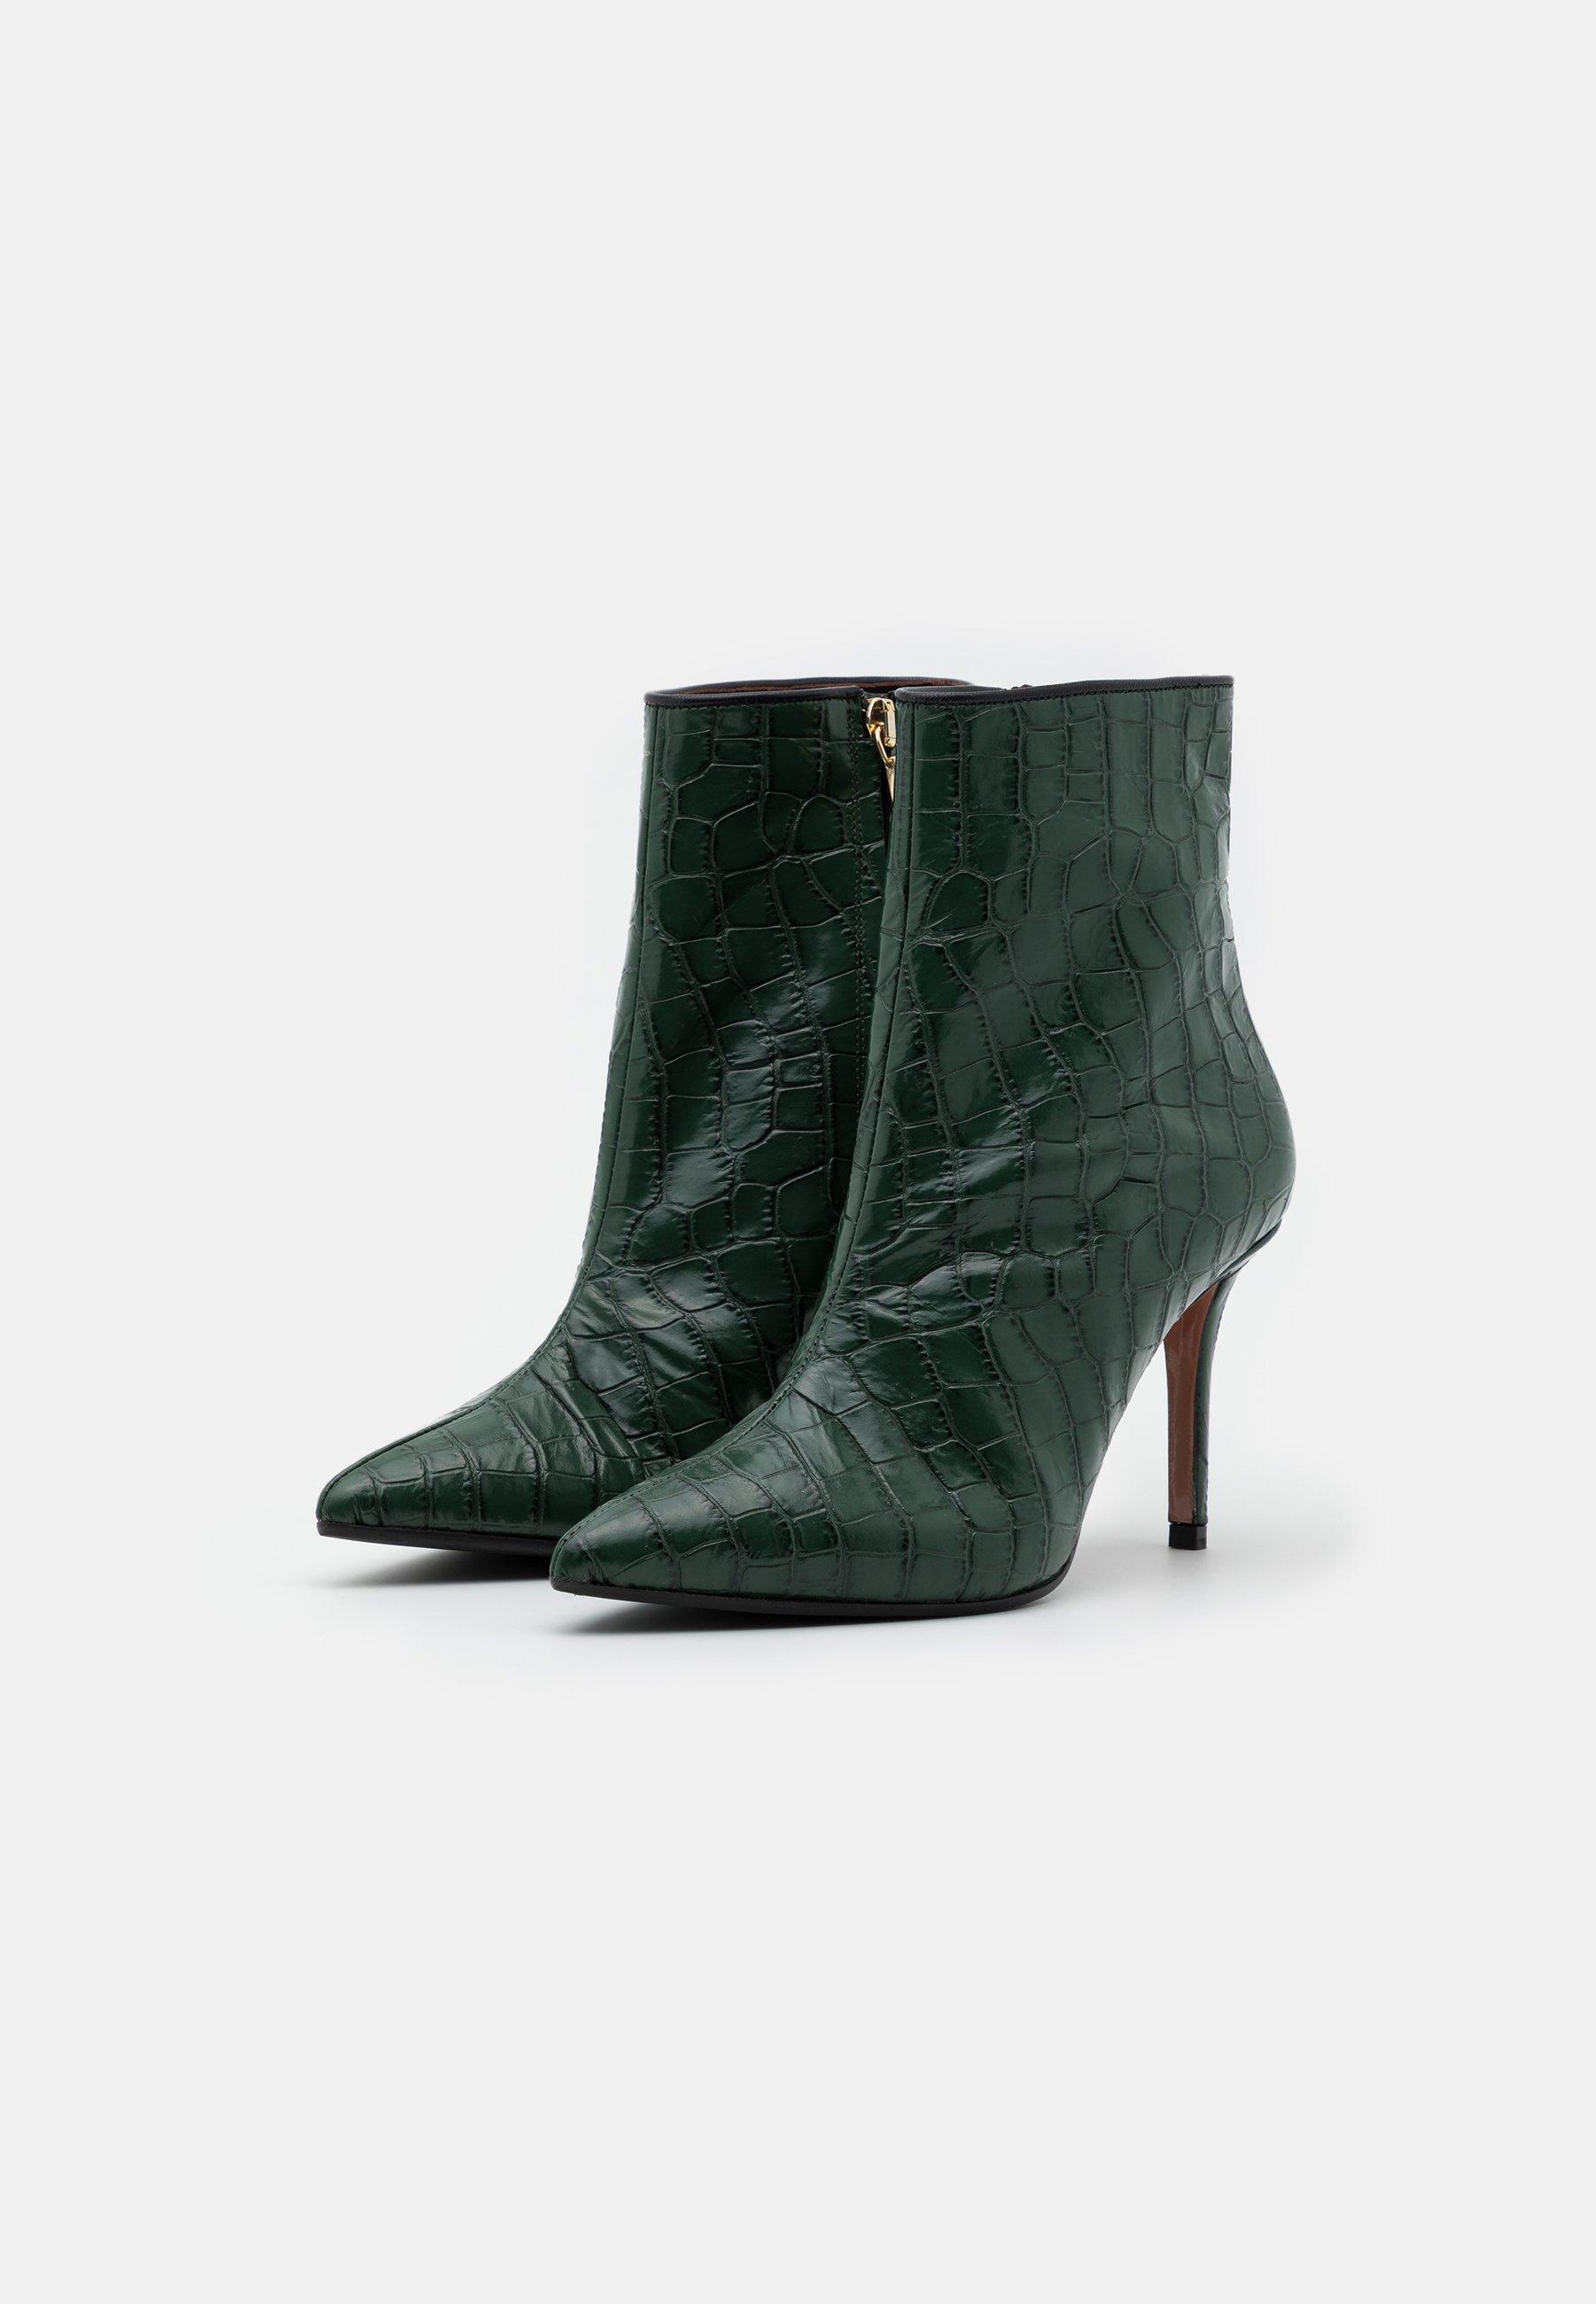 Oxitaly LUISA High Heel Stiefelette green/grün